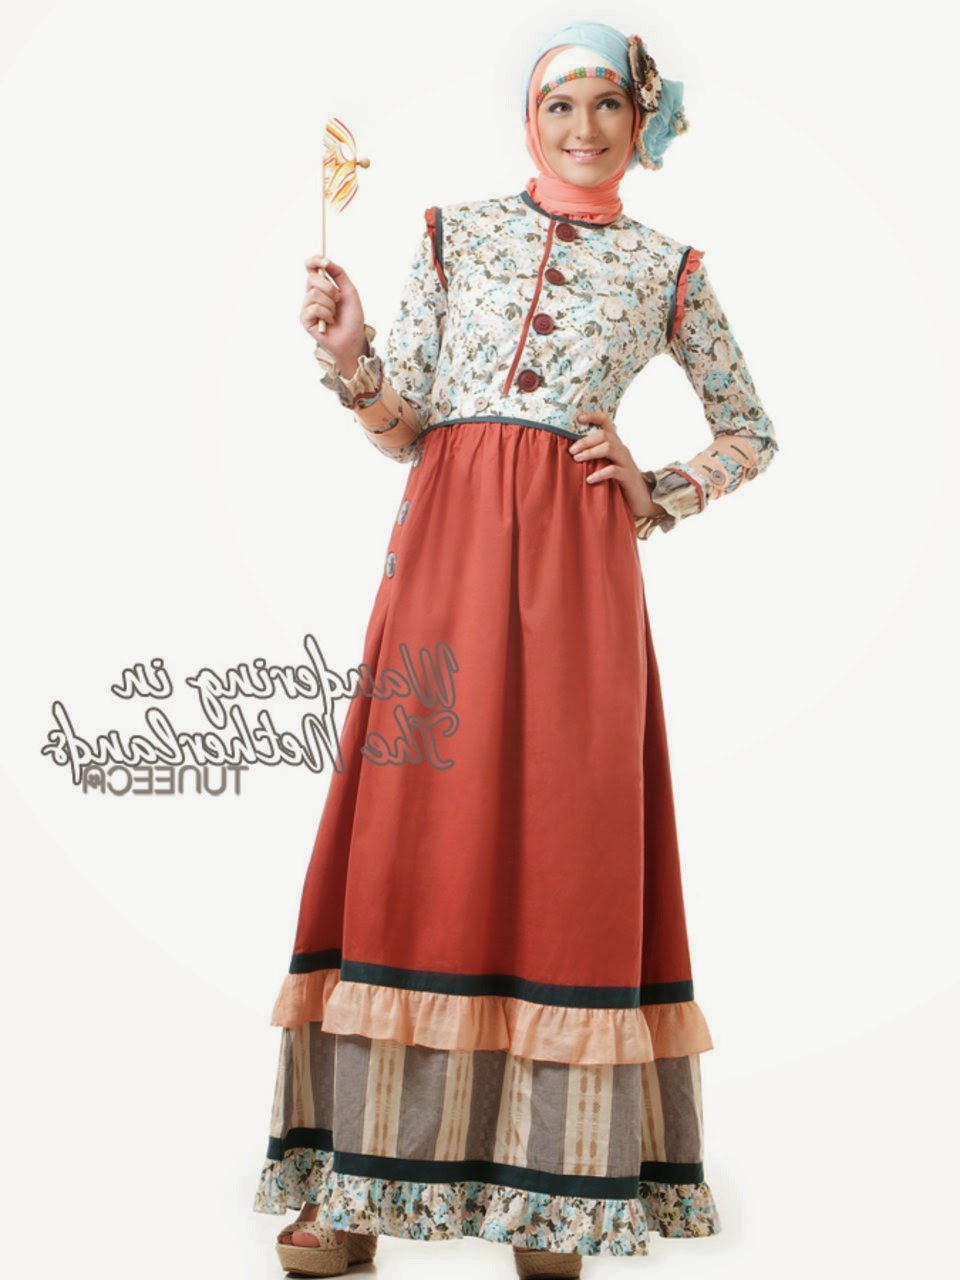 Bentuk Gambar Baju Lebaran Terbaru Bqdd 12 Contoh Model Gamis Muslim Lebaran Terbaru Kumpulan